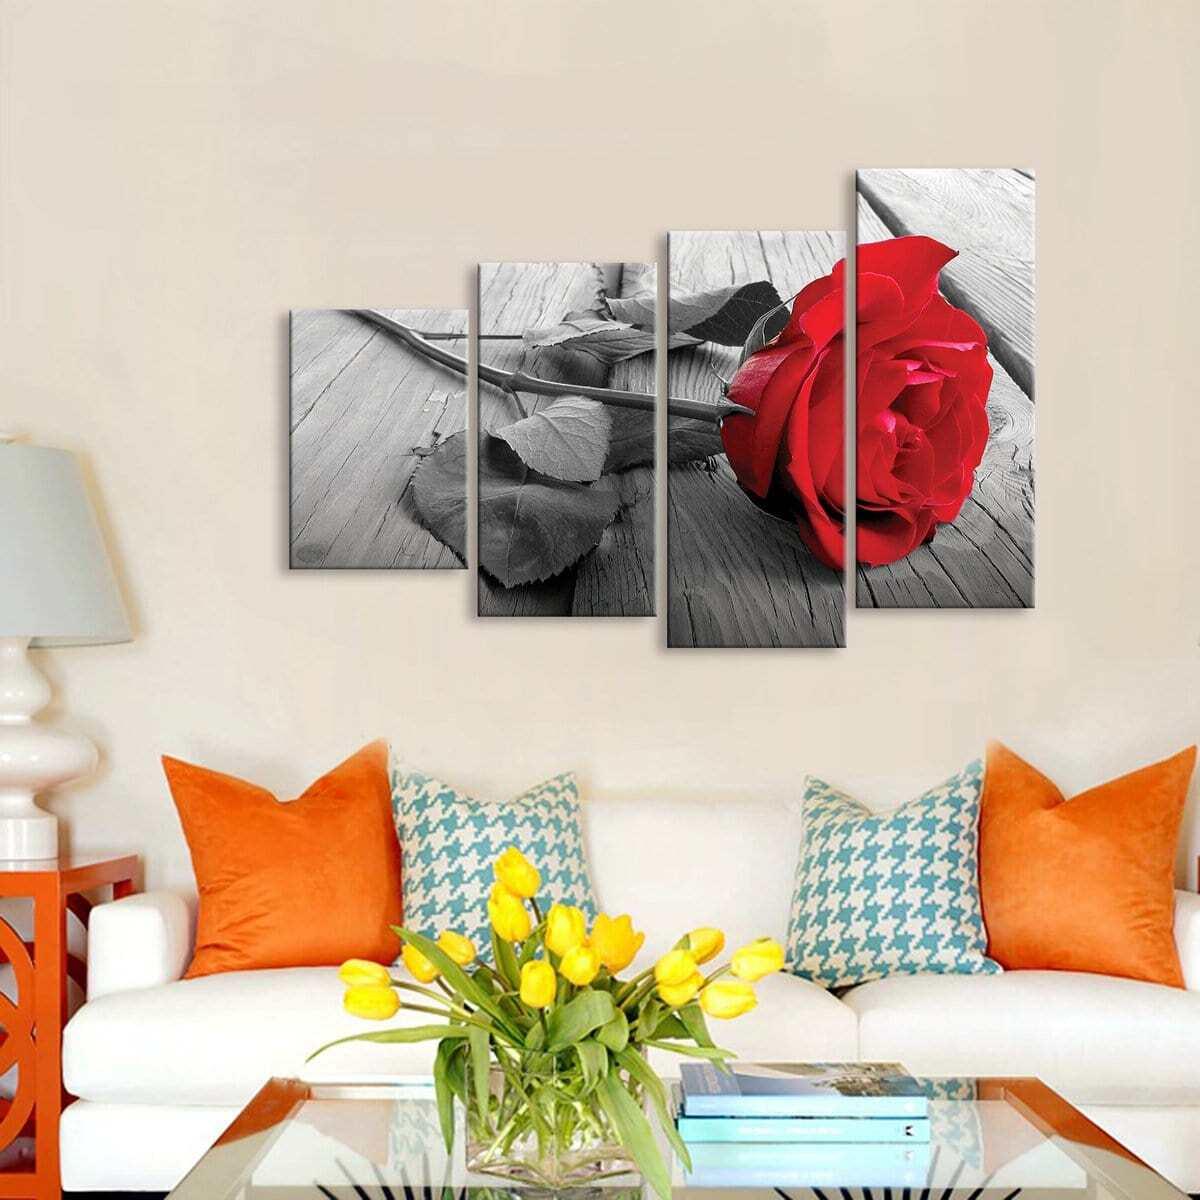 SHEIN / Wanddekor mit Rose Muster 4pcs